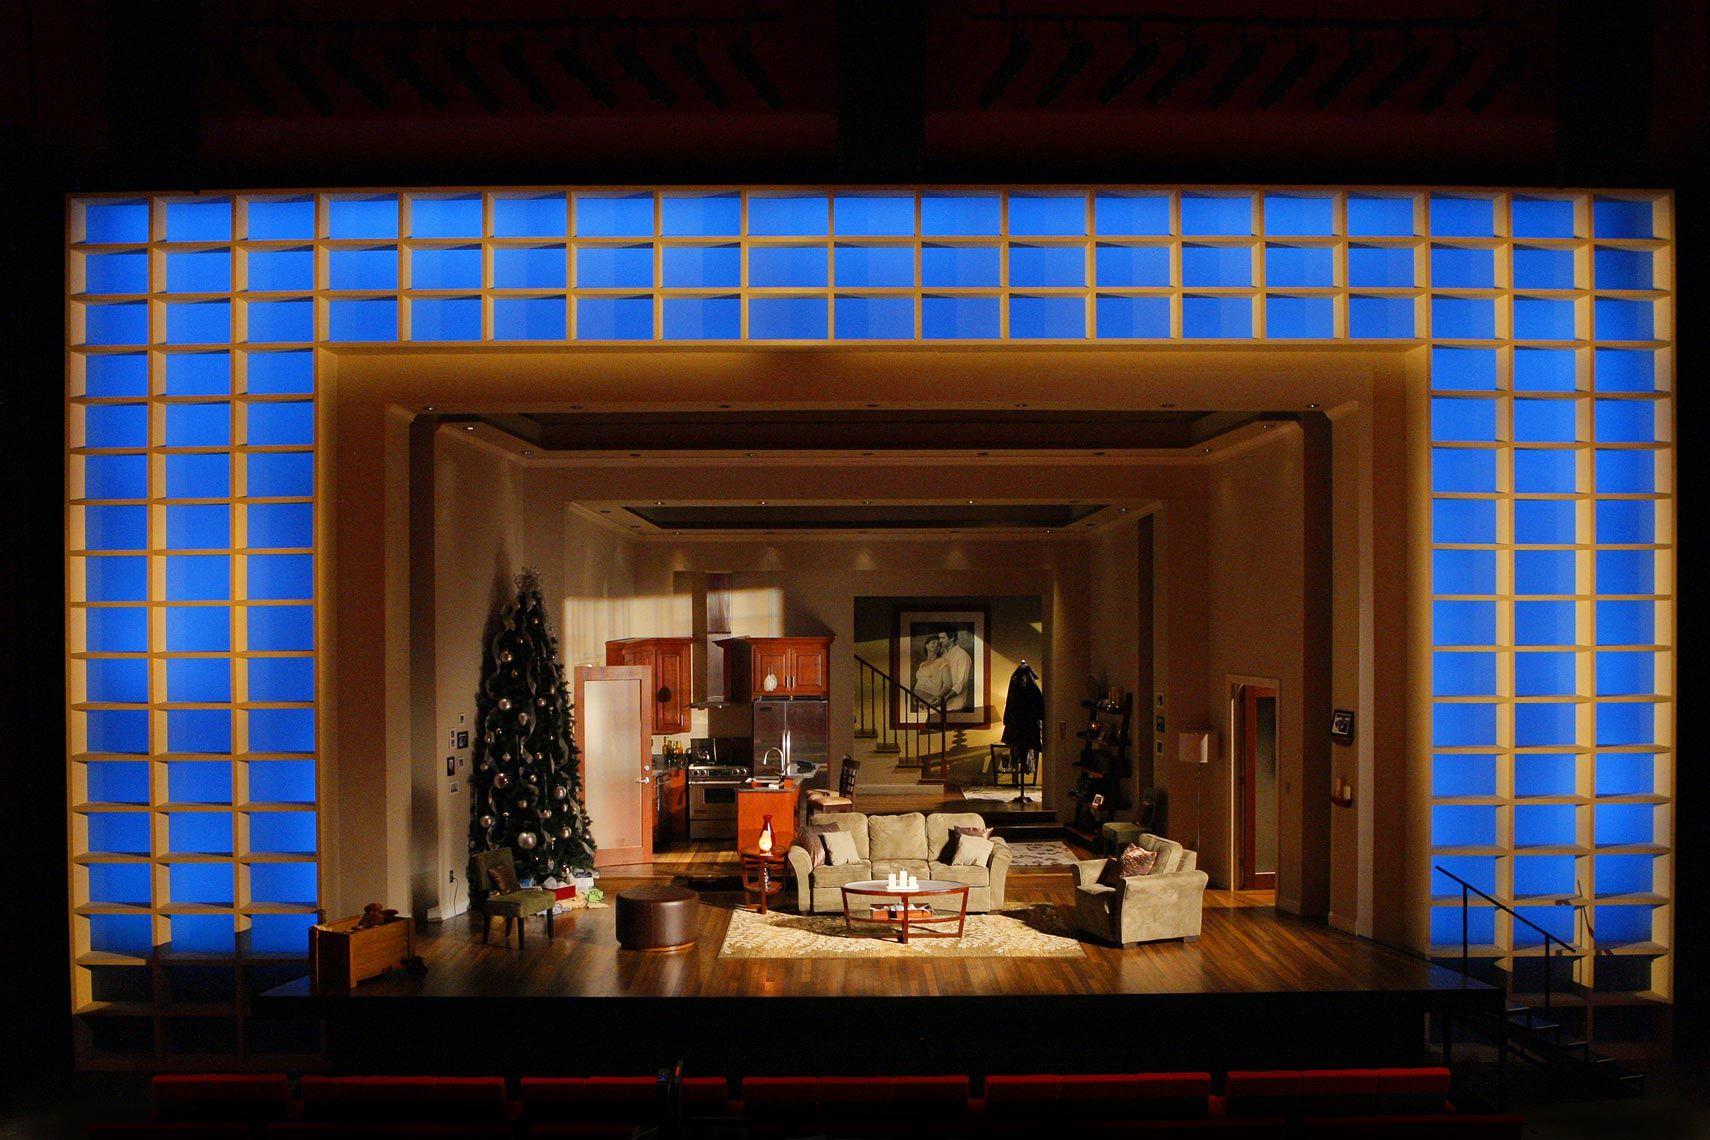 Dollhouse. Guthrie Theater. Scenic design by Alexander Dodge. Lighting by Josh Epstein.